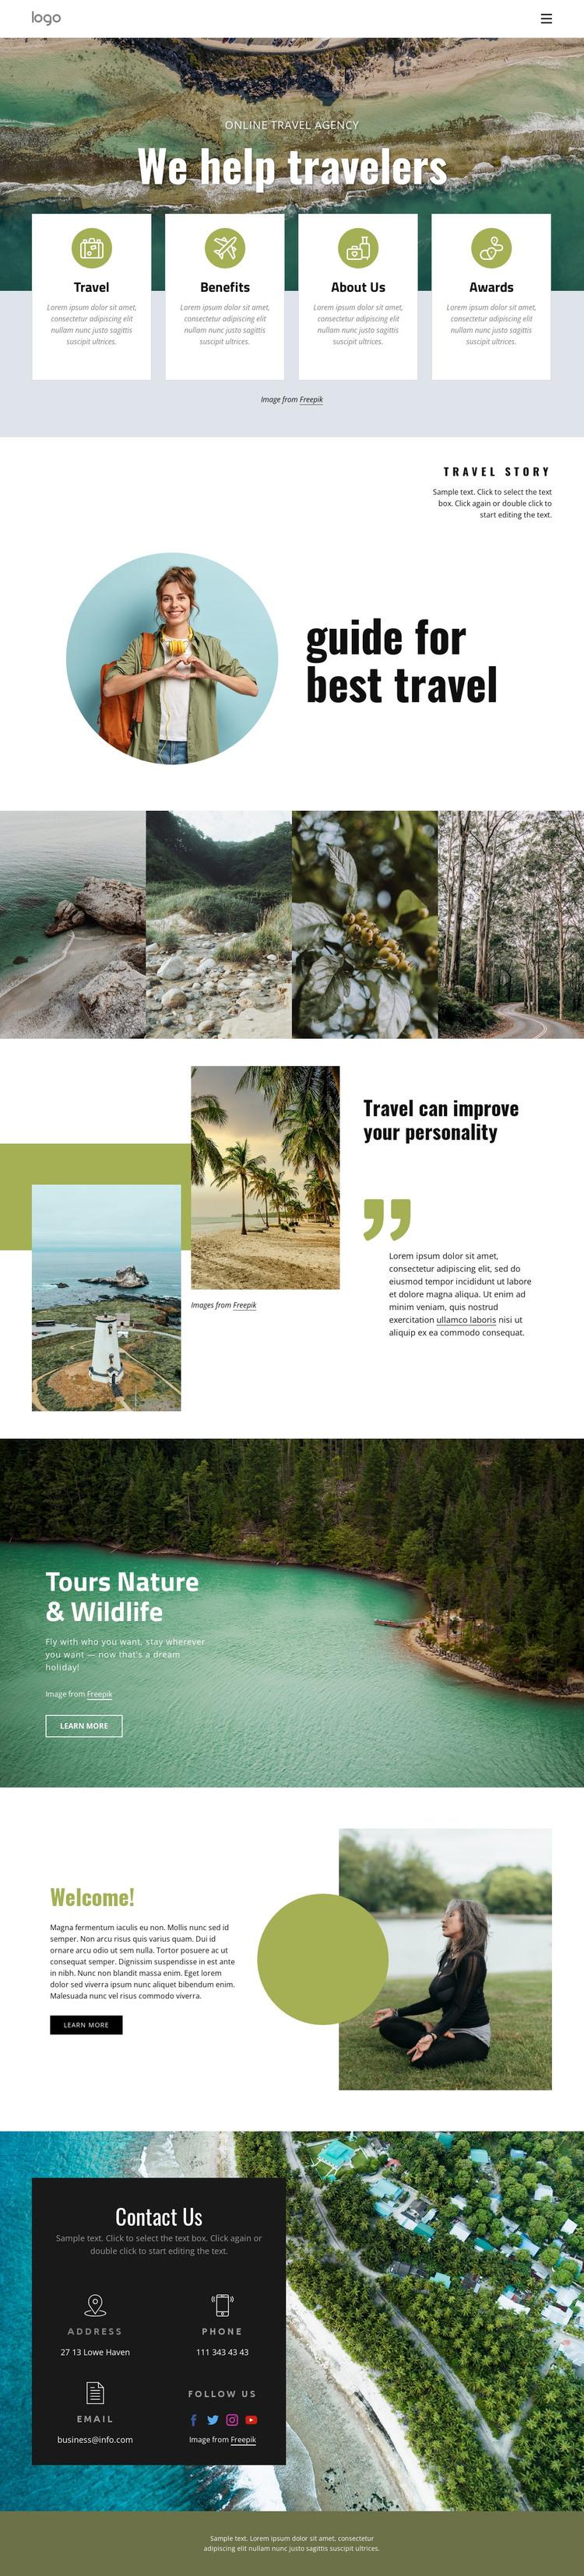 We help manage your trip WordPress Theme